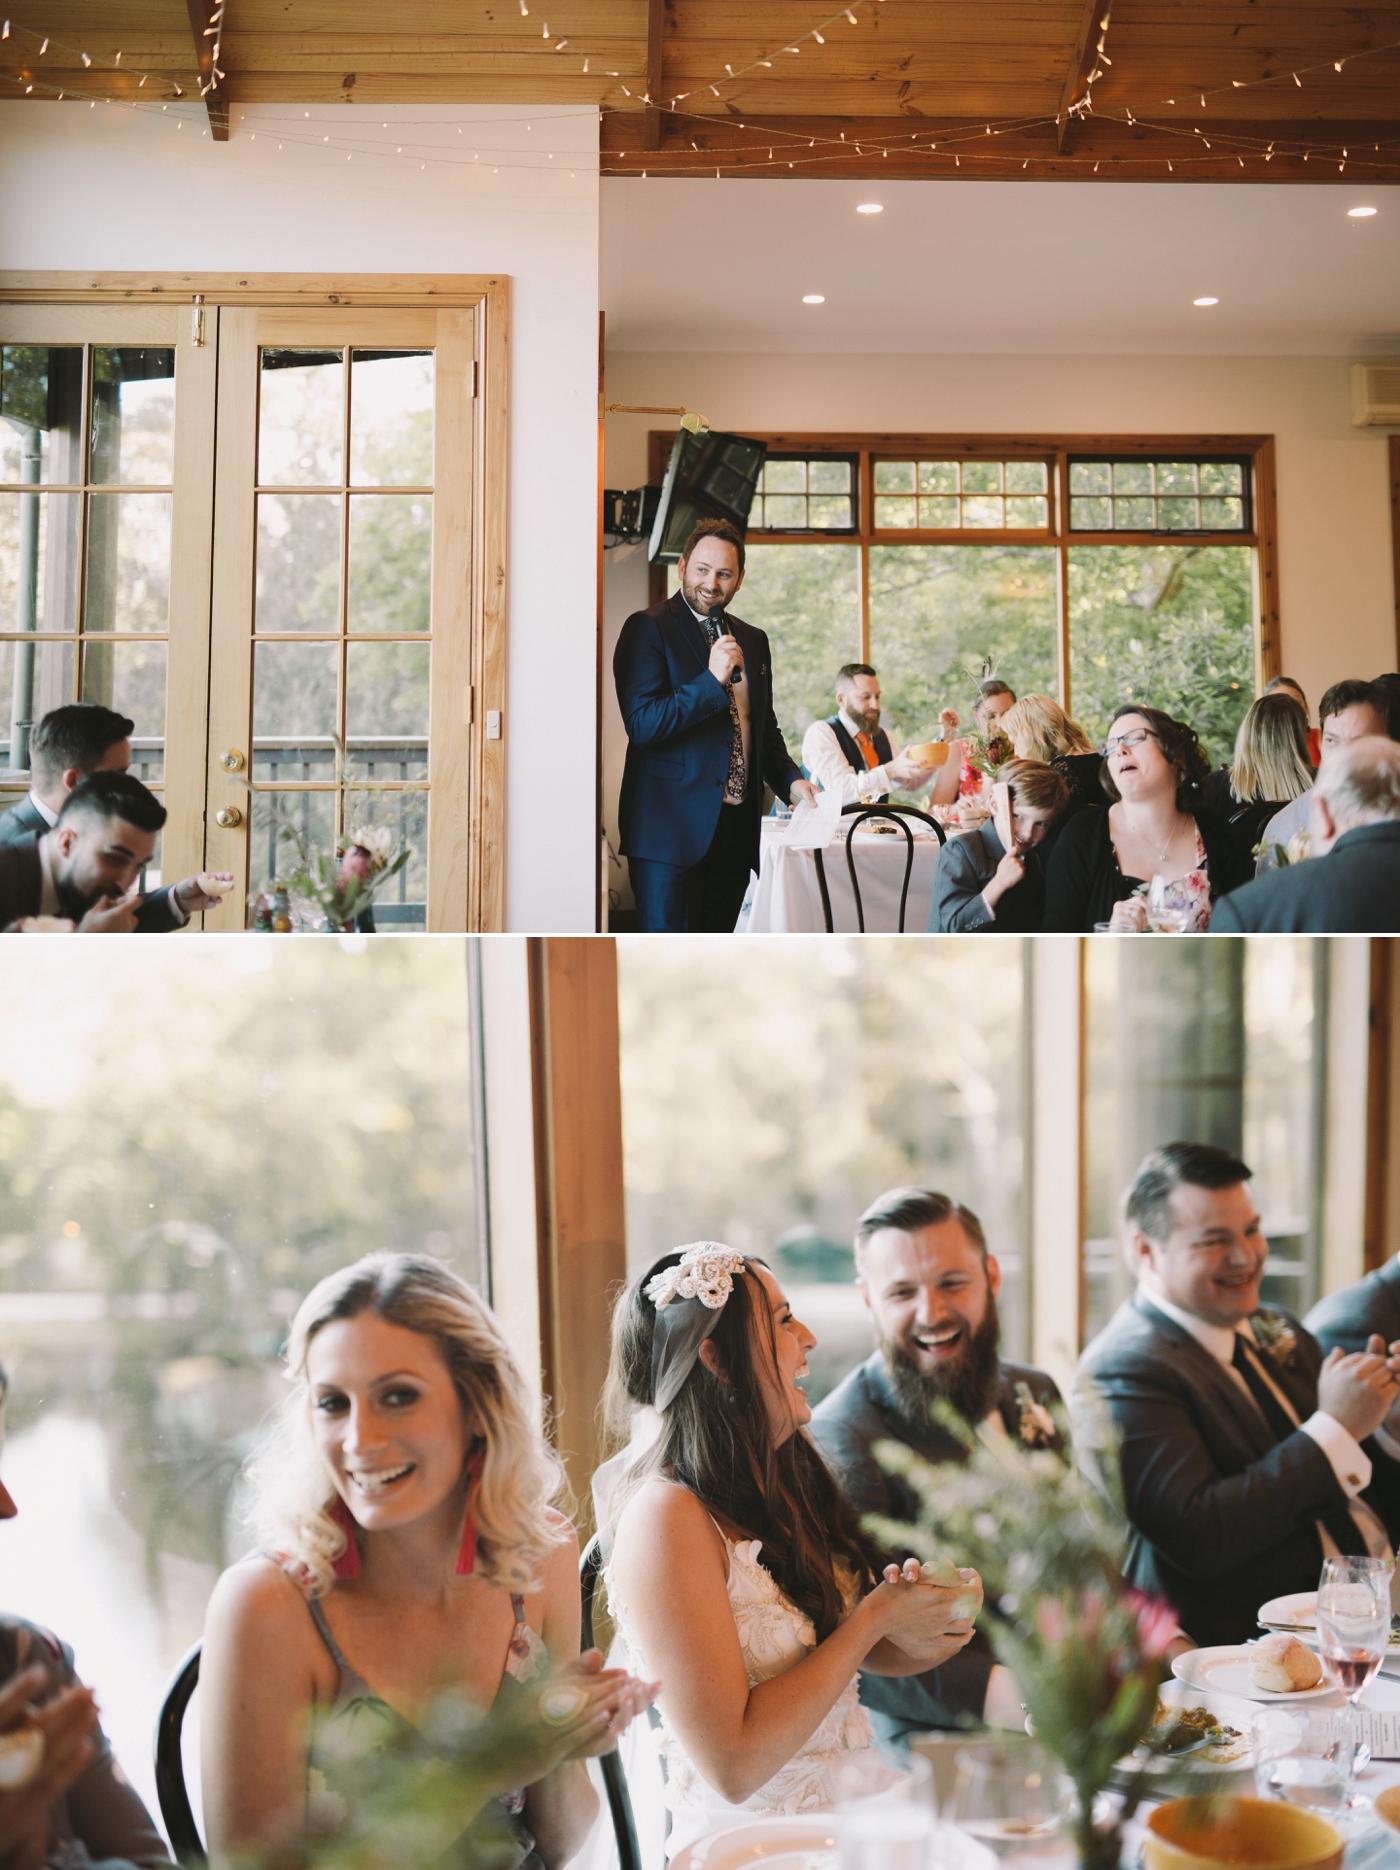 Maddy & Wes - K1 by Geoff Hardy Wedding - Adelaide Wedding Photographer - Natural wedding photography in Adelaide - Katherine Schultz_0055.jpg